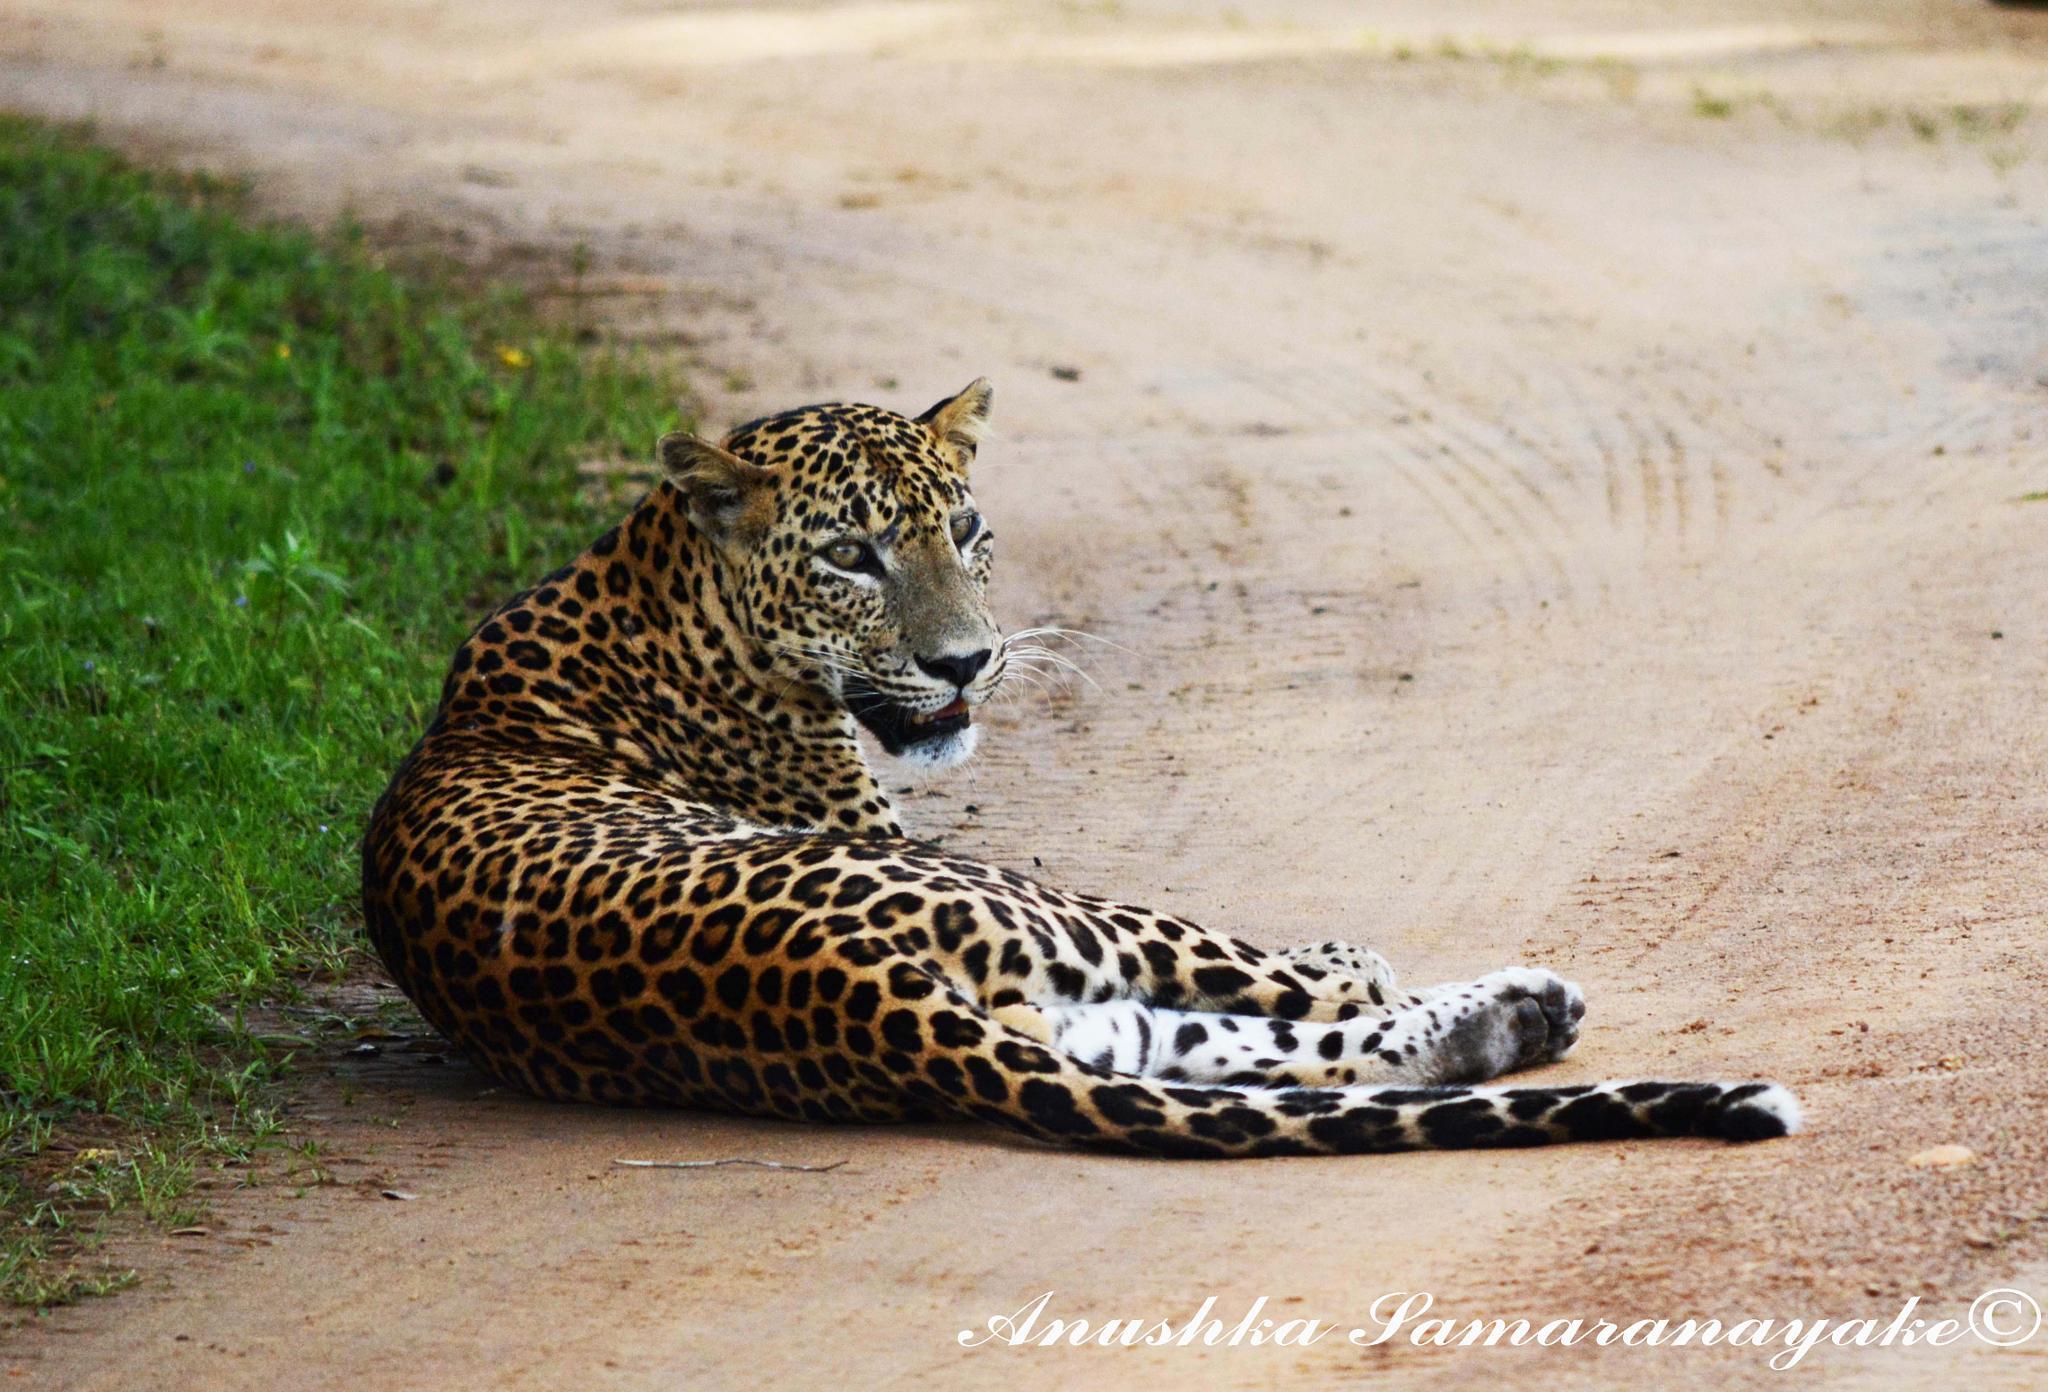 Lazy Leopard by Anushka Samaranayaka